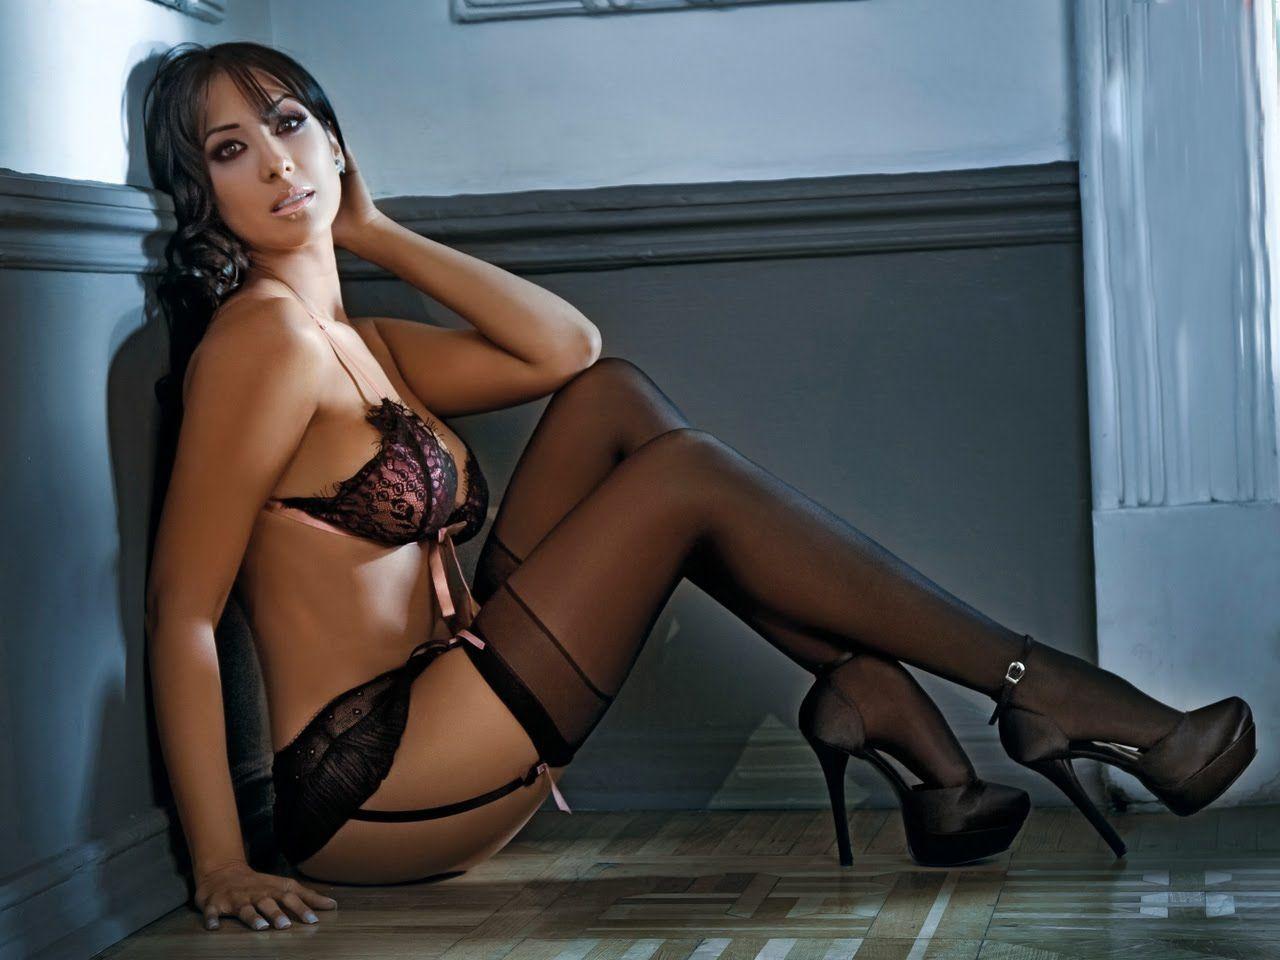 Cynthia urias hot girl bed